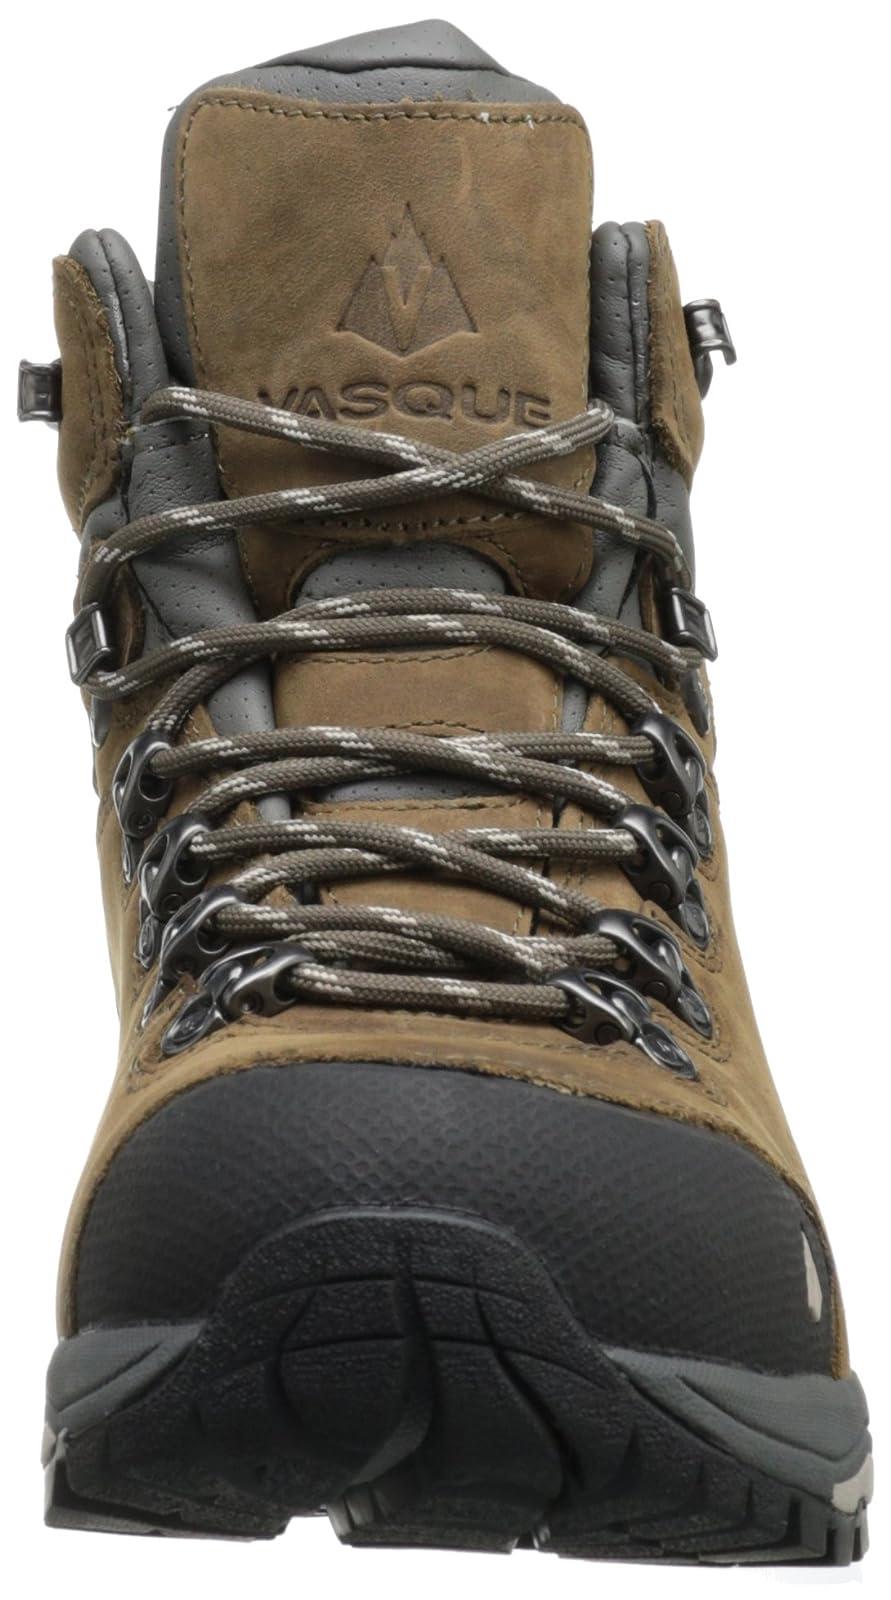 Vasque Women's St. Elias Gore-Tex Hiking Boot 8 M US Women - 4